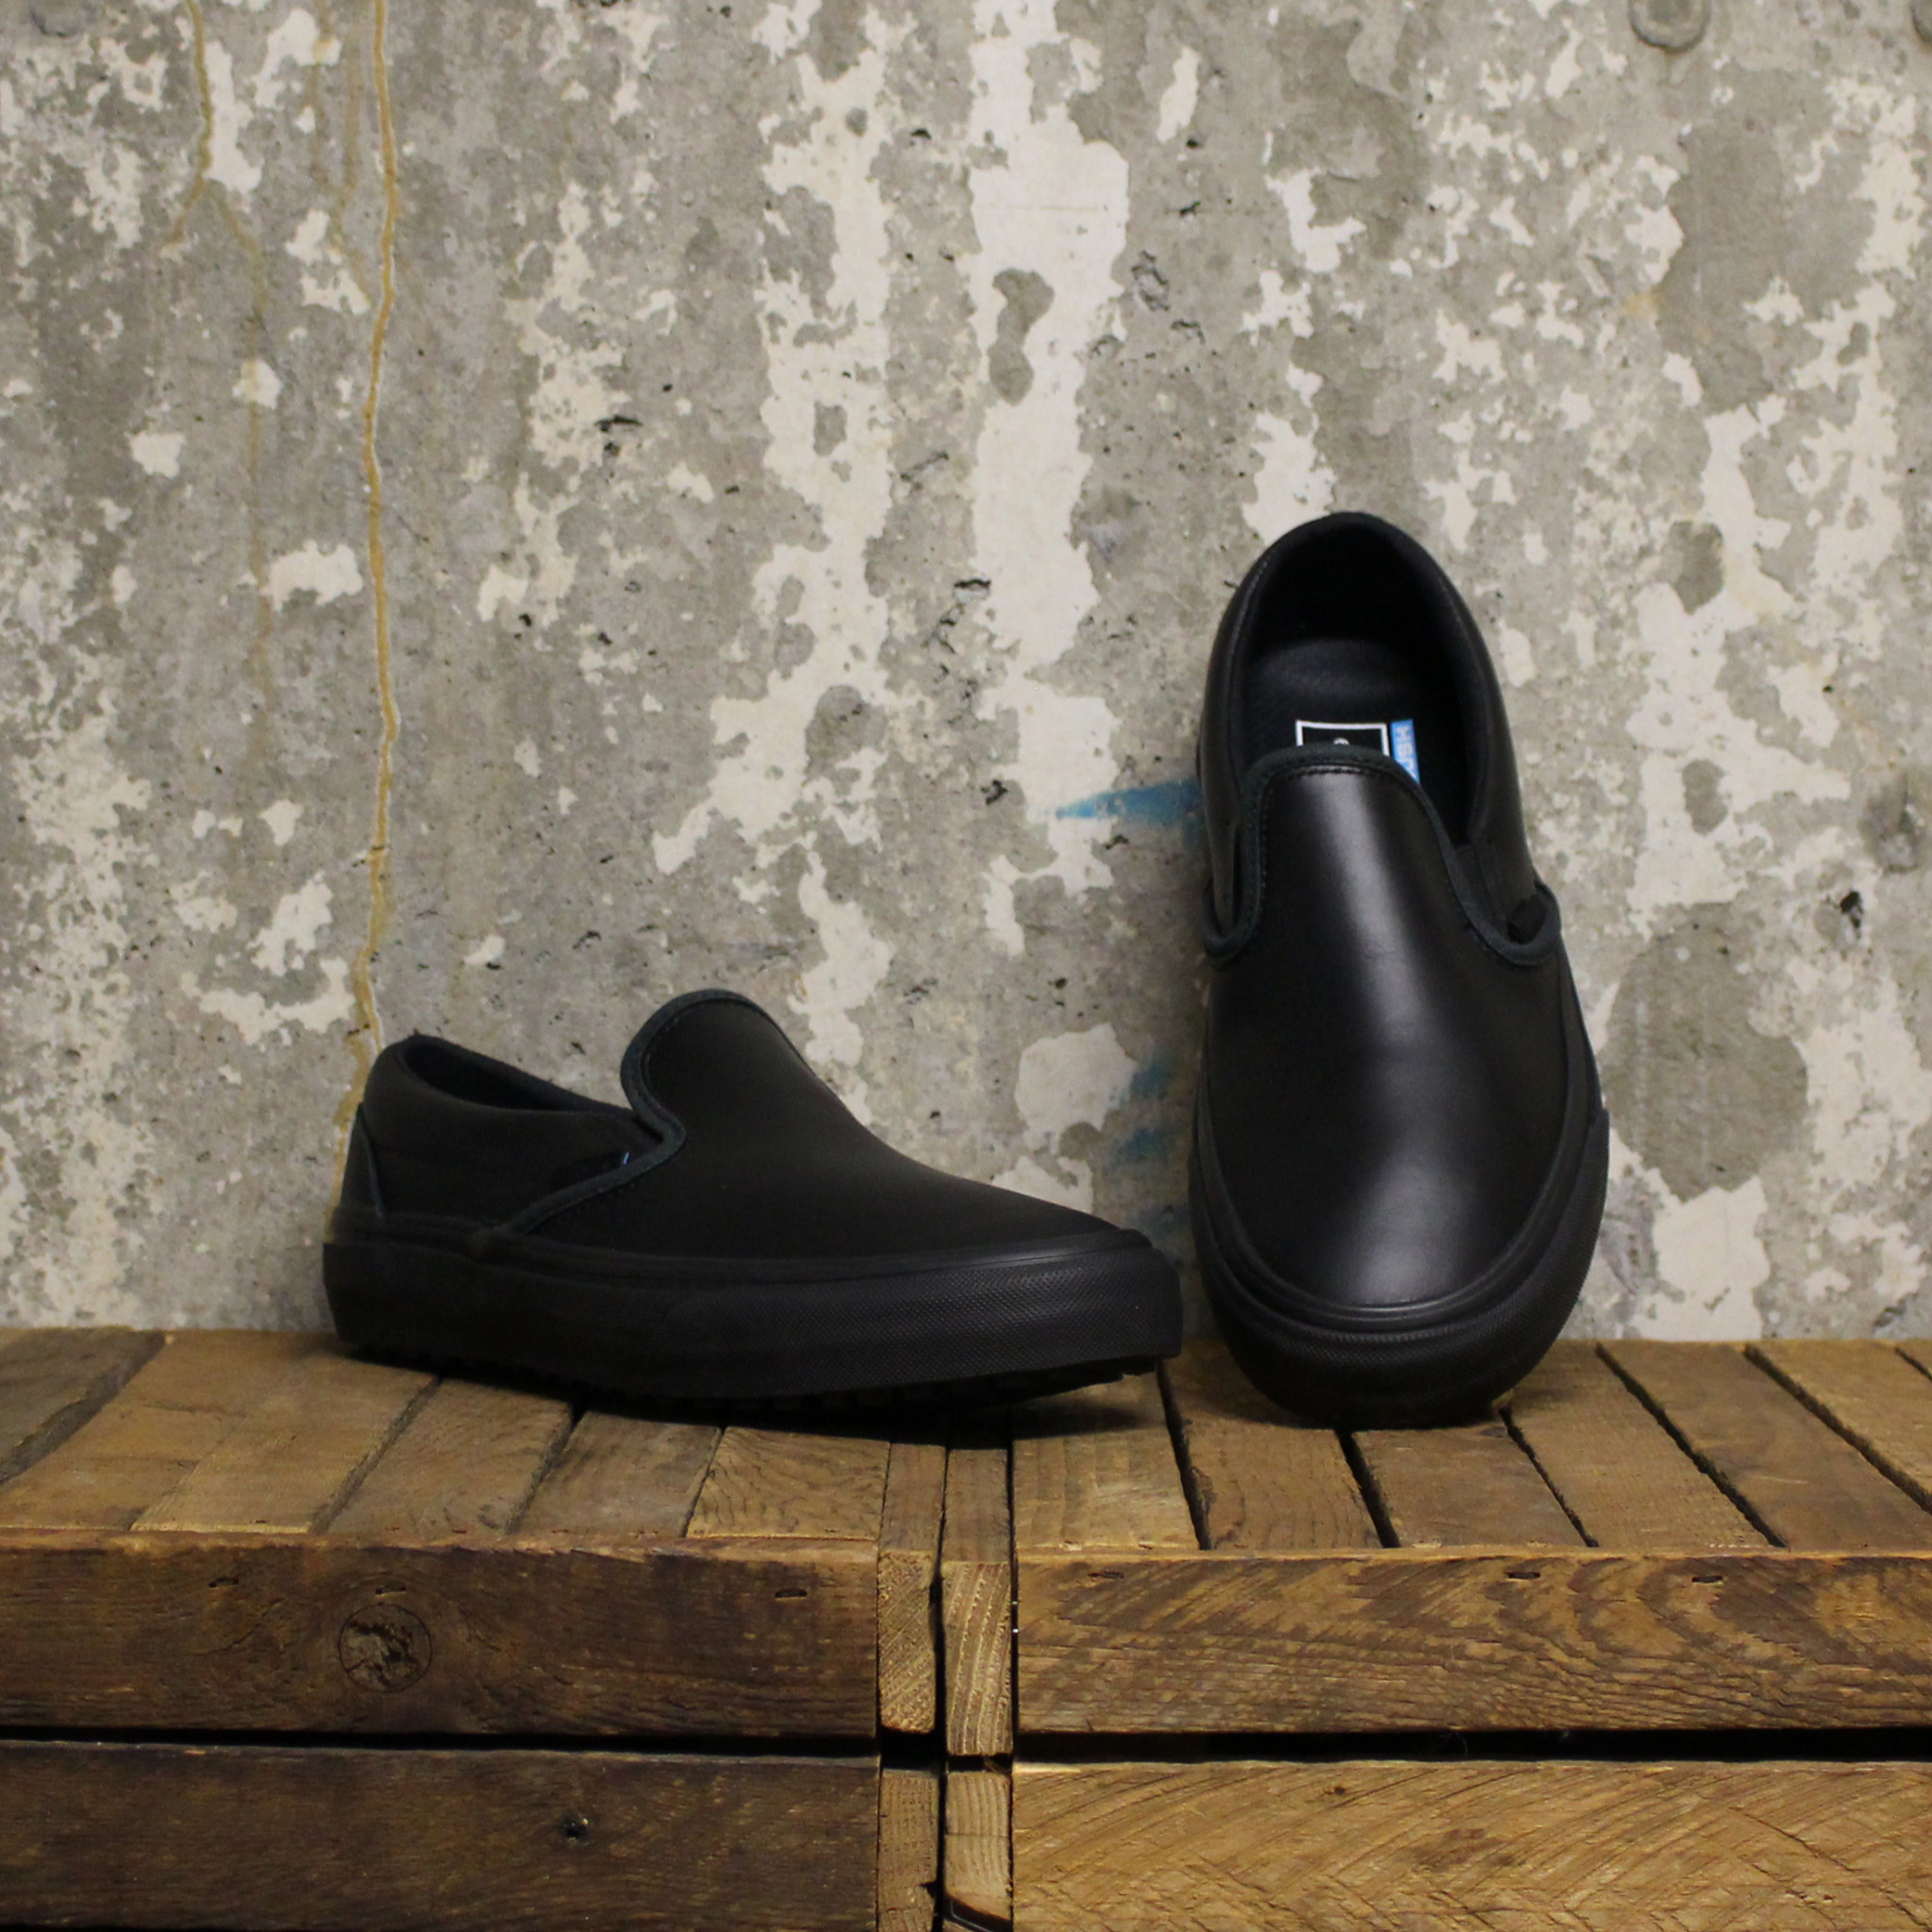 Vans Vans Classic Slip-On UC (Made for the Makers 2.0) - Black/Black